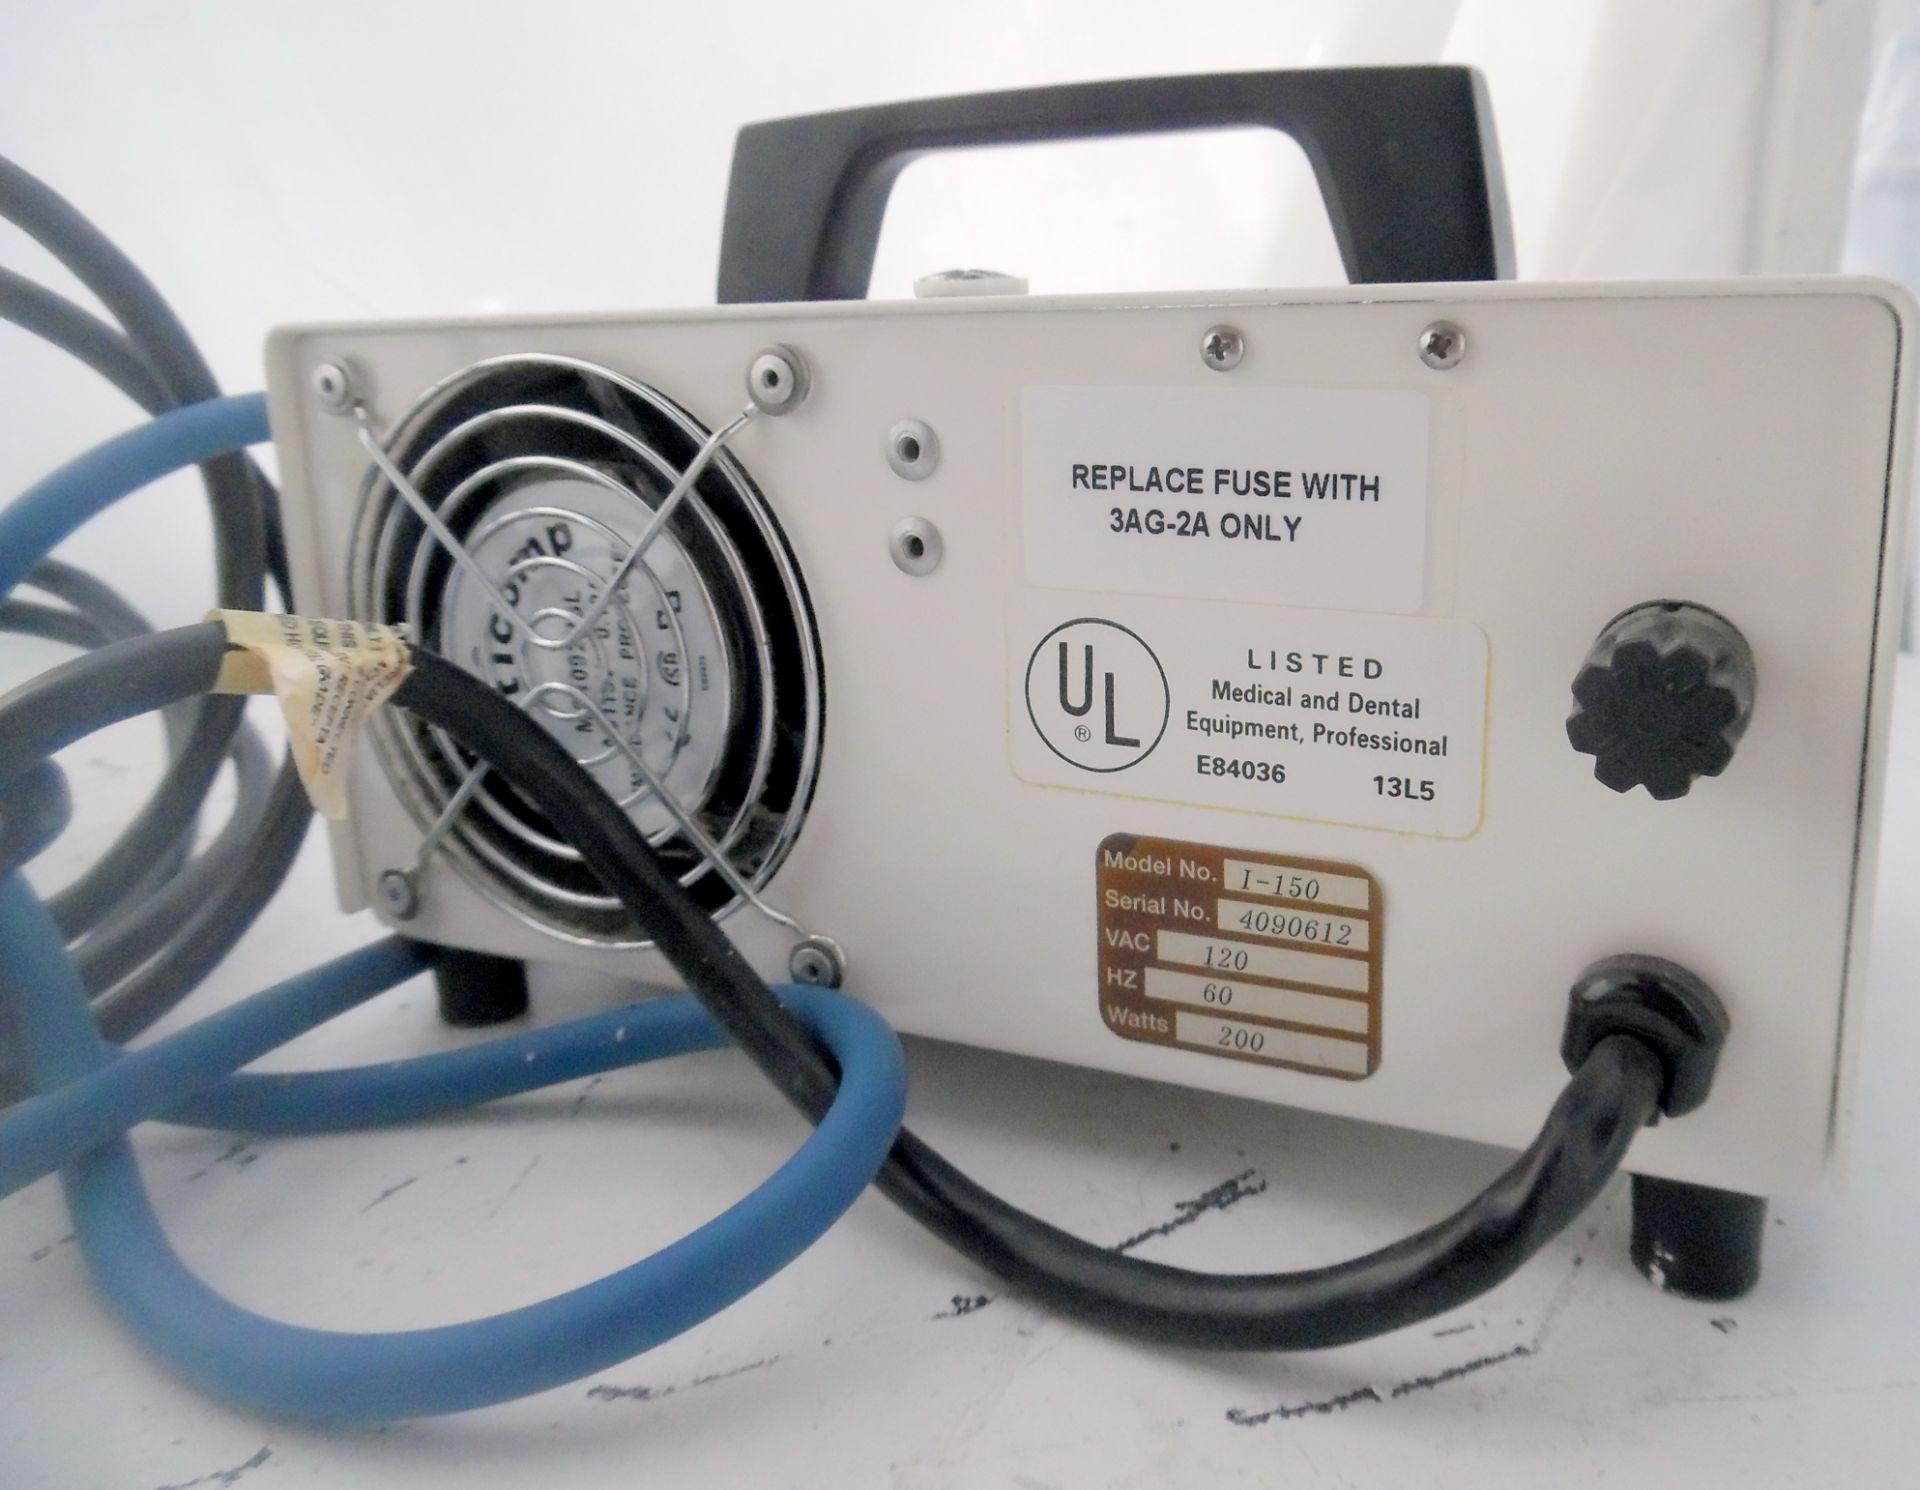 Cuda Model I-150 Light Source 120V 200 Watts - Image 4 of 5